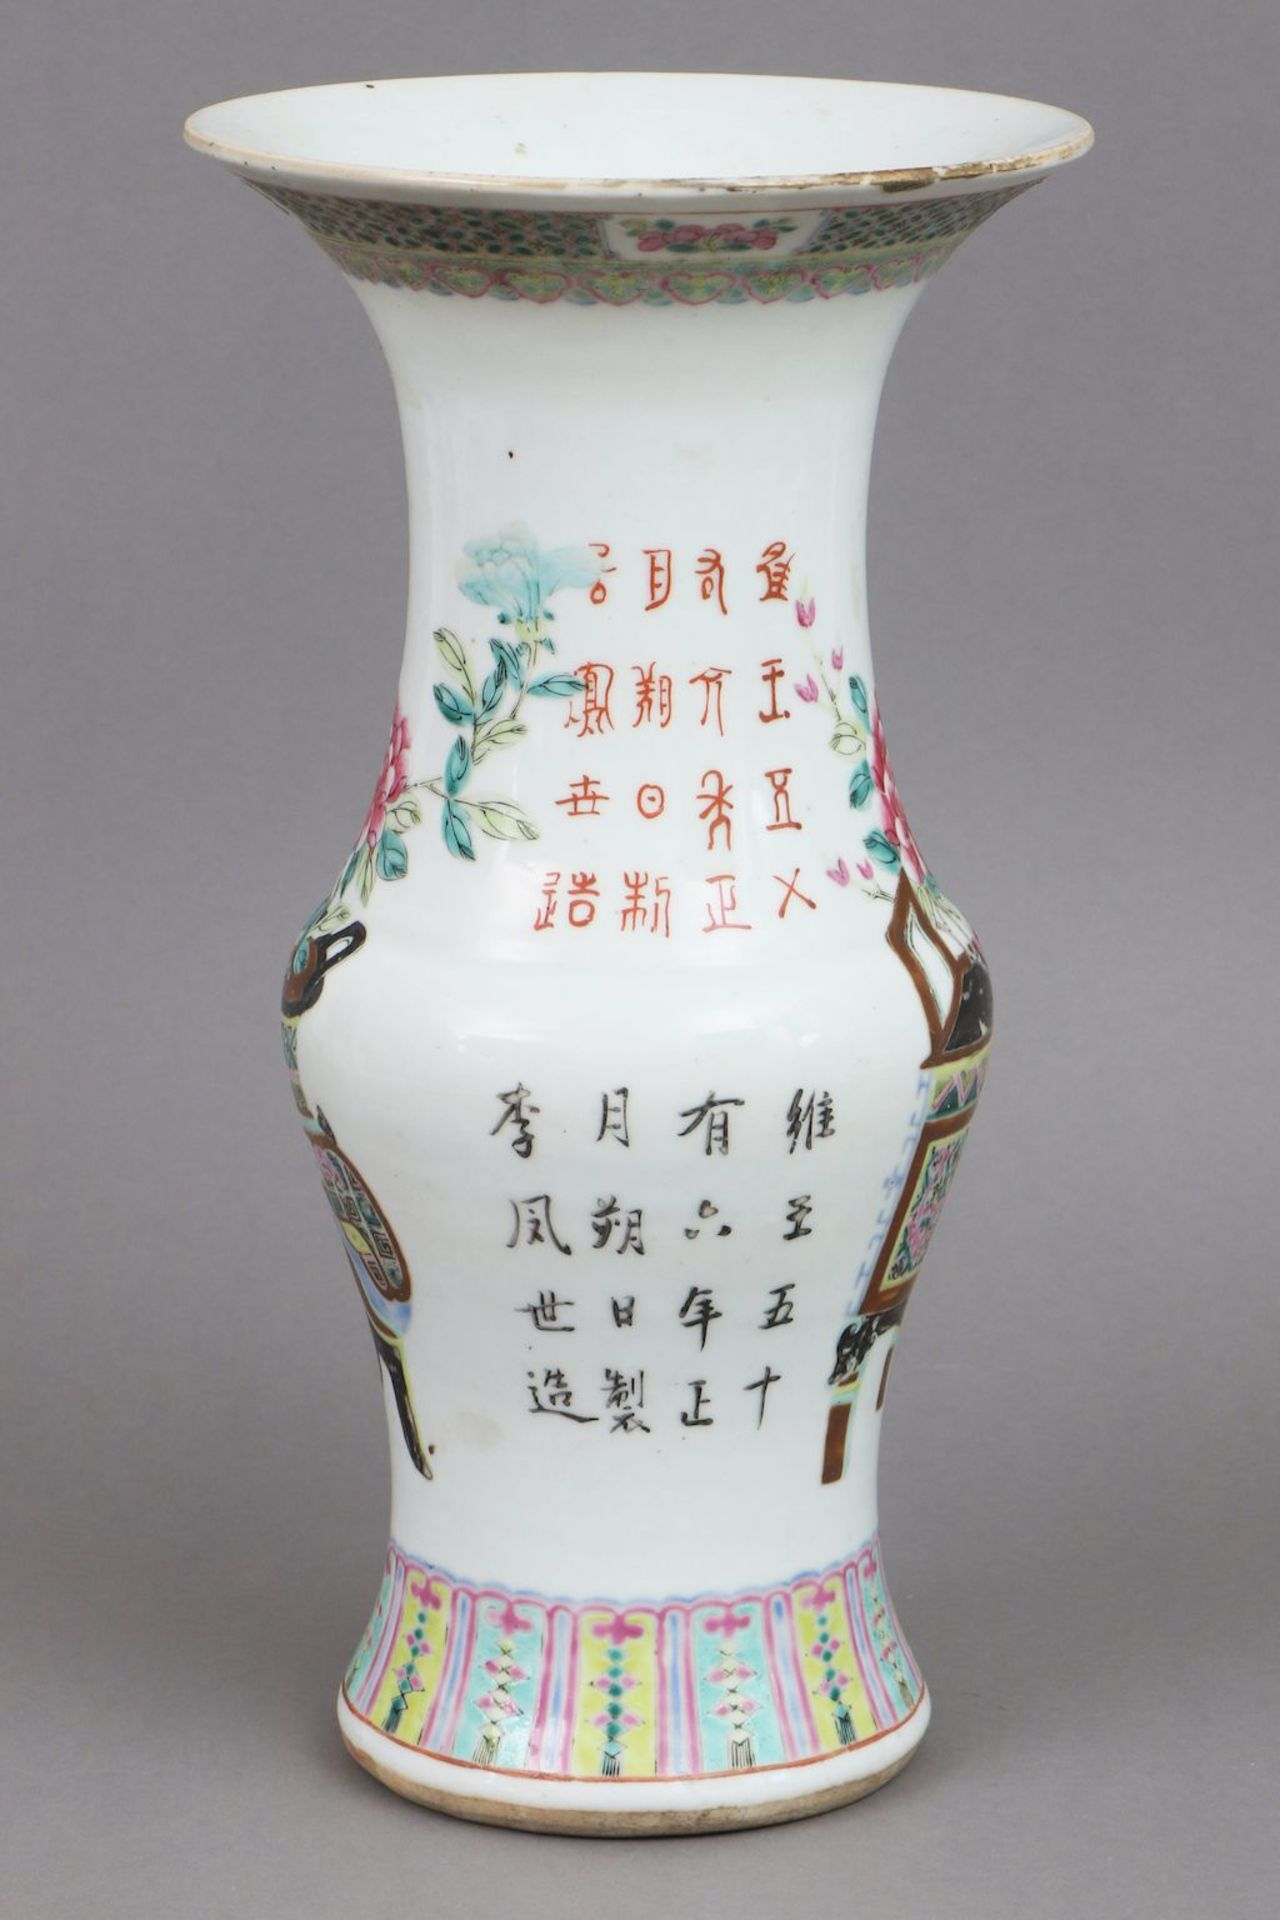 Chinesisches famille rose Vasengefäß in Zun-Form - Image 2 of 4